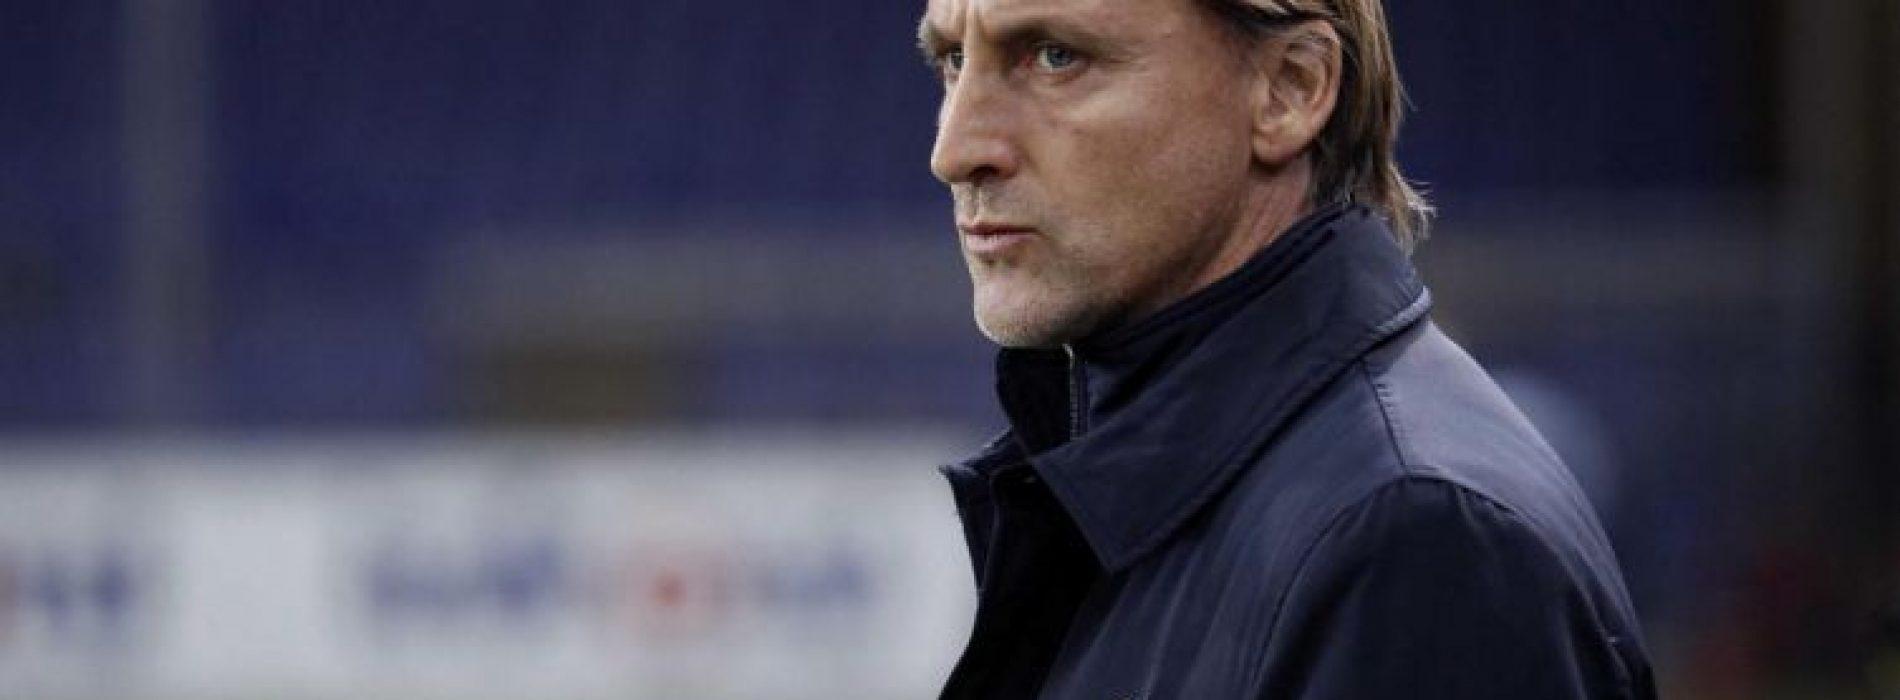 "Nicola intervista Genoa Juventus: ""Stasera ho visto un'intensità diversa"""